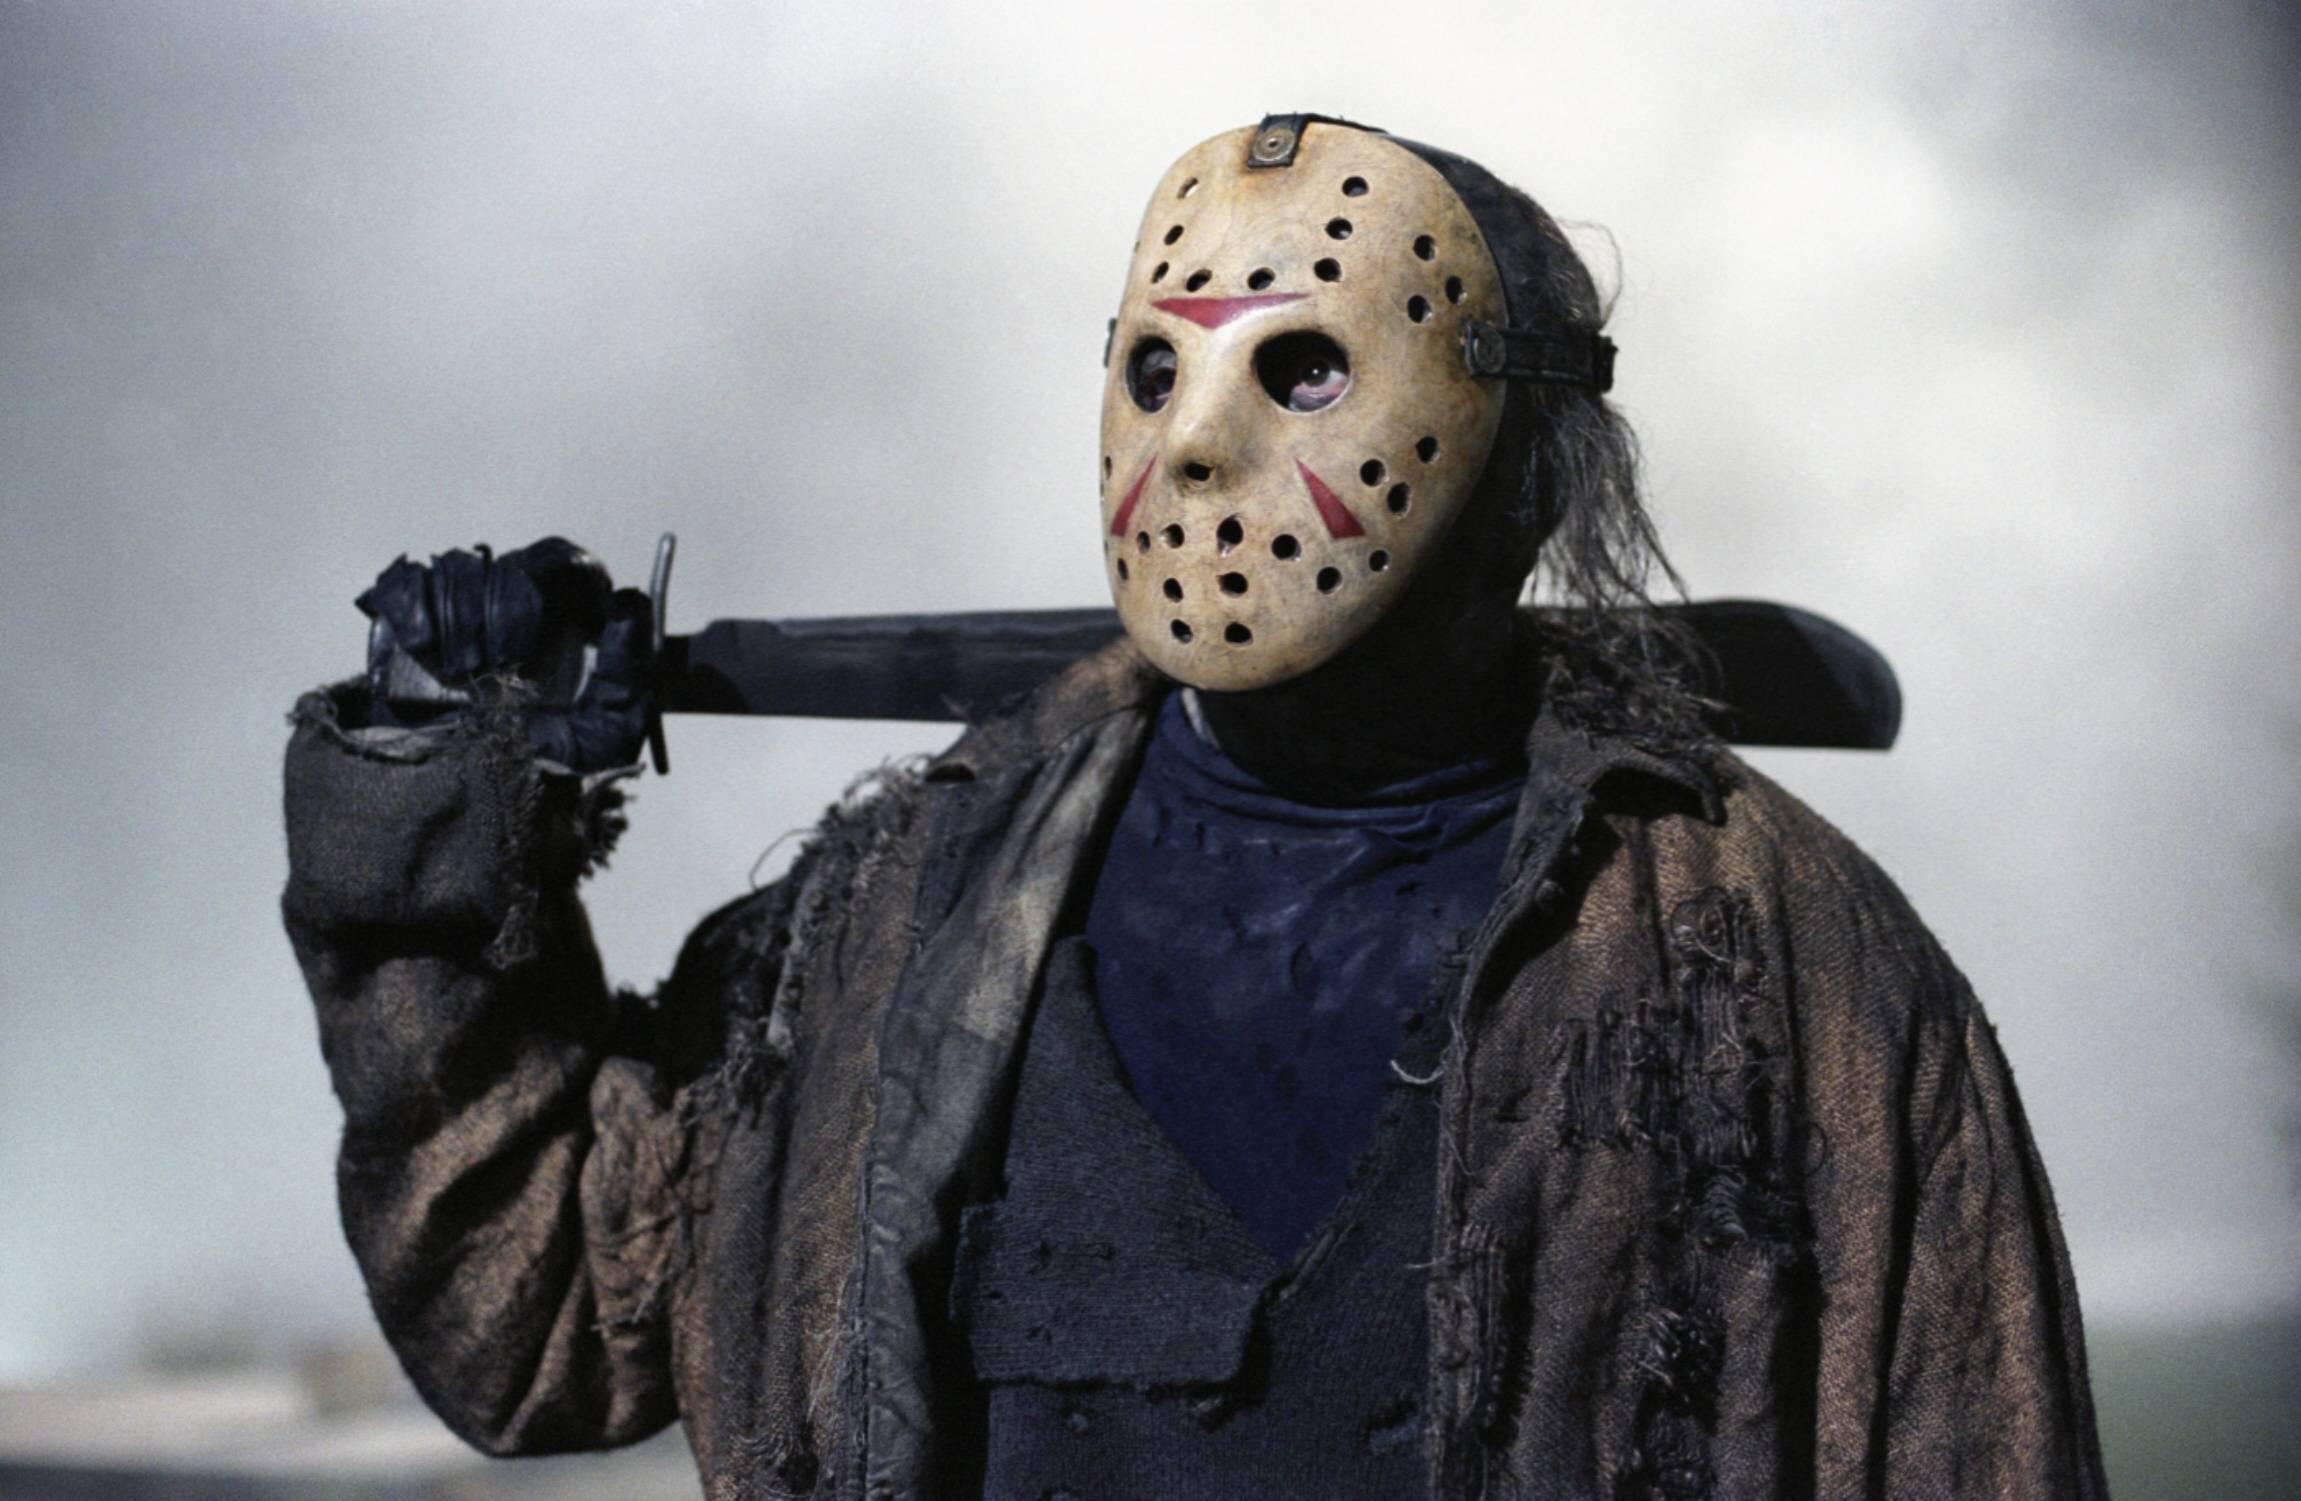 jason, friday the 13th, udklædning, kostume, klæd ud, halloween, halloweenkostume, creepy, skræmmende